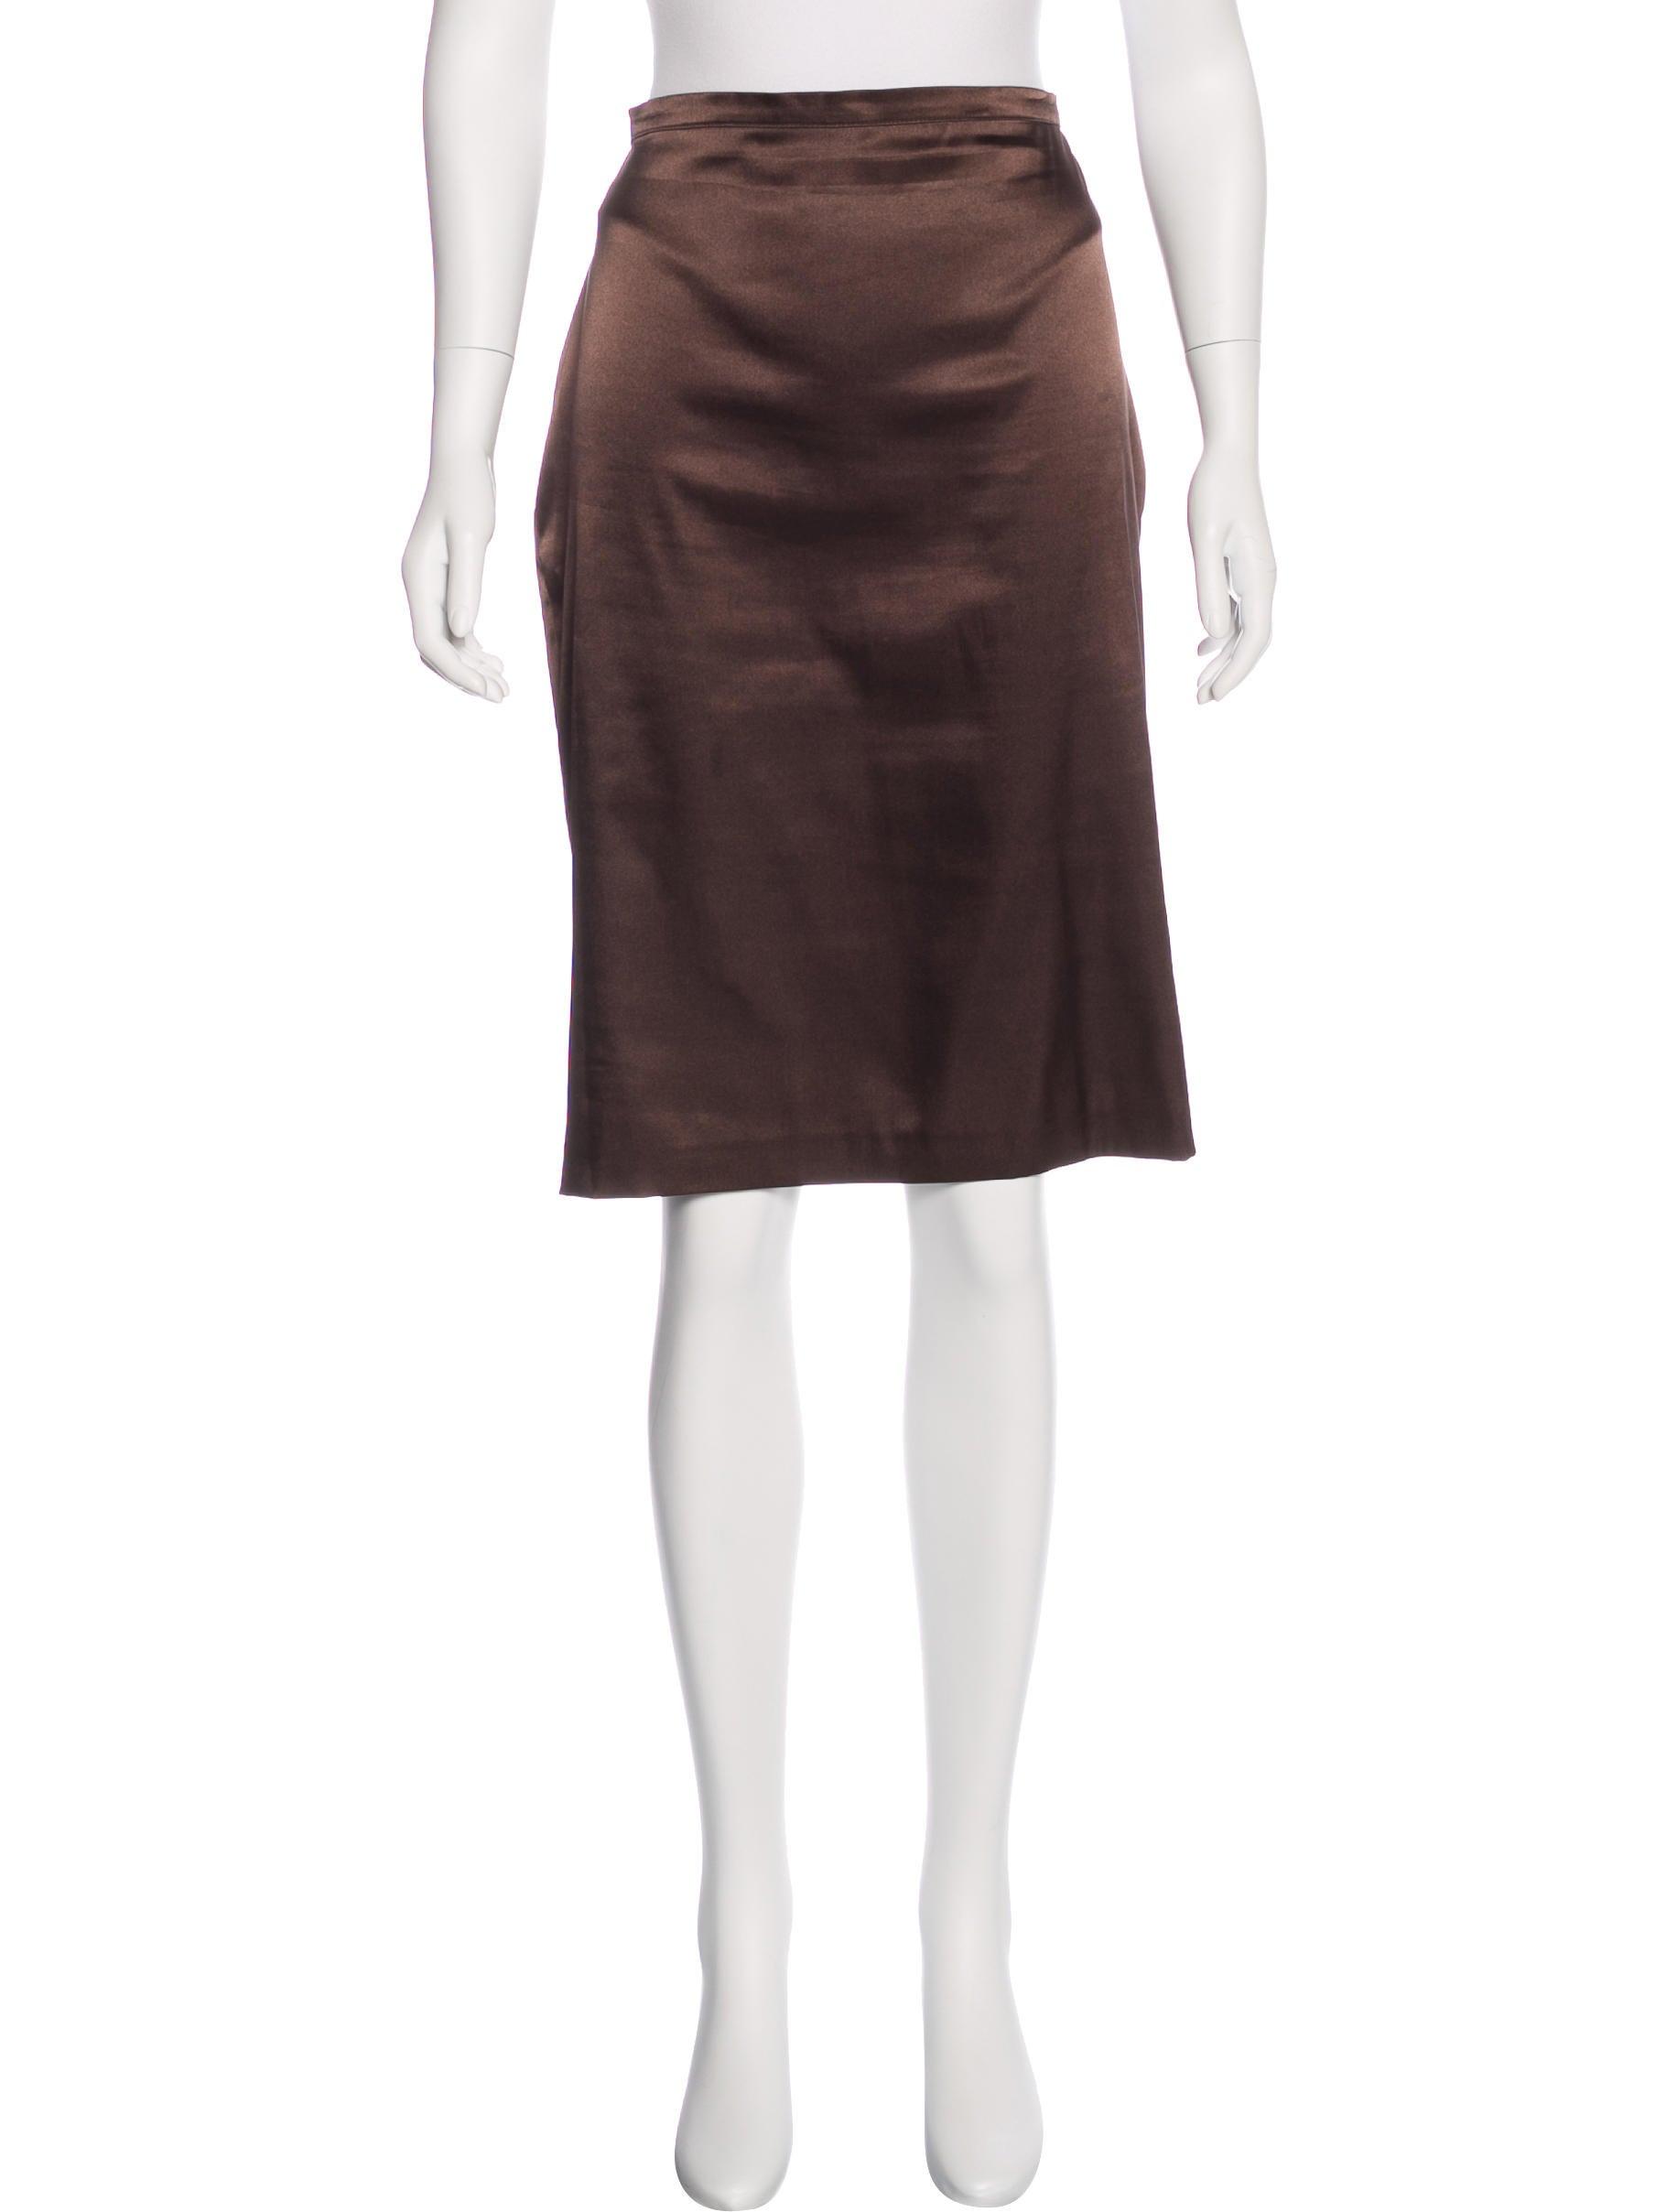 d g satin pencil skirt clothing wdg36455 the realreal